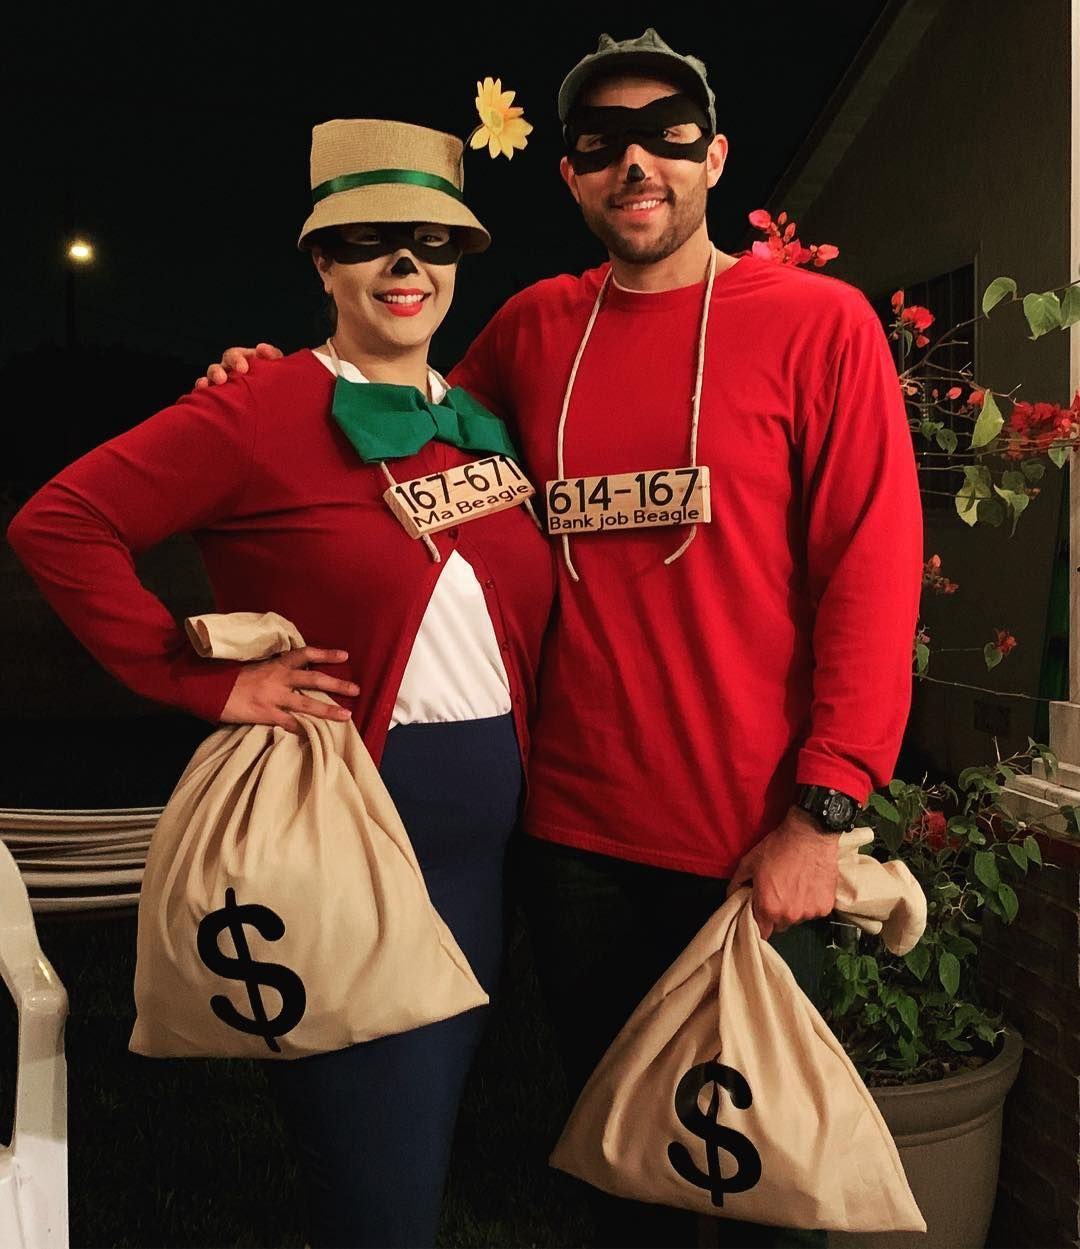 Diy Disney Villains Costumes Ideas Tutorials Boy Costumes